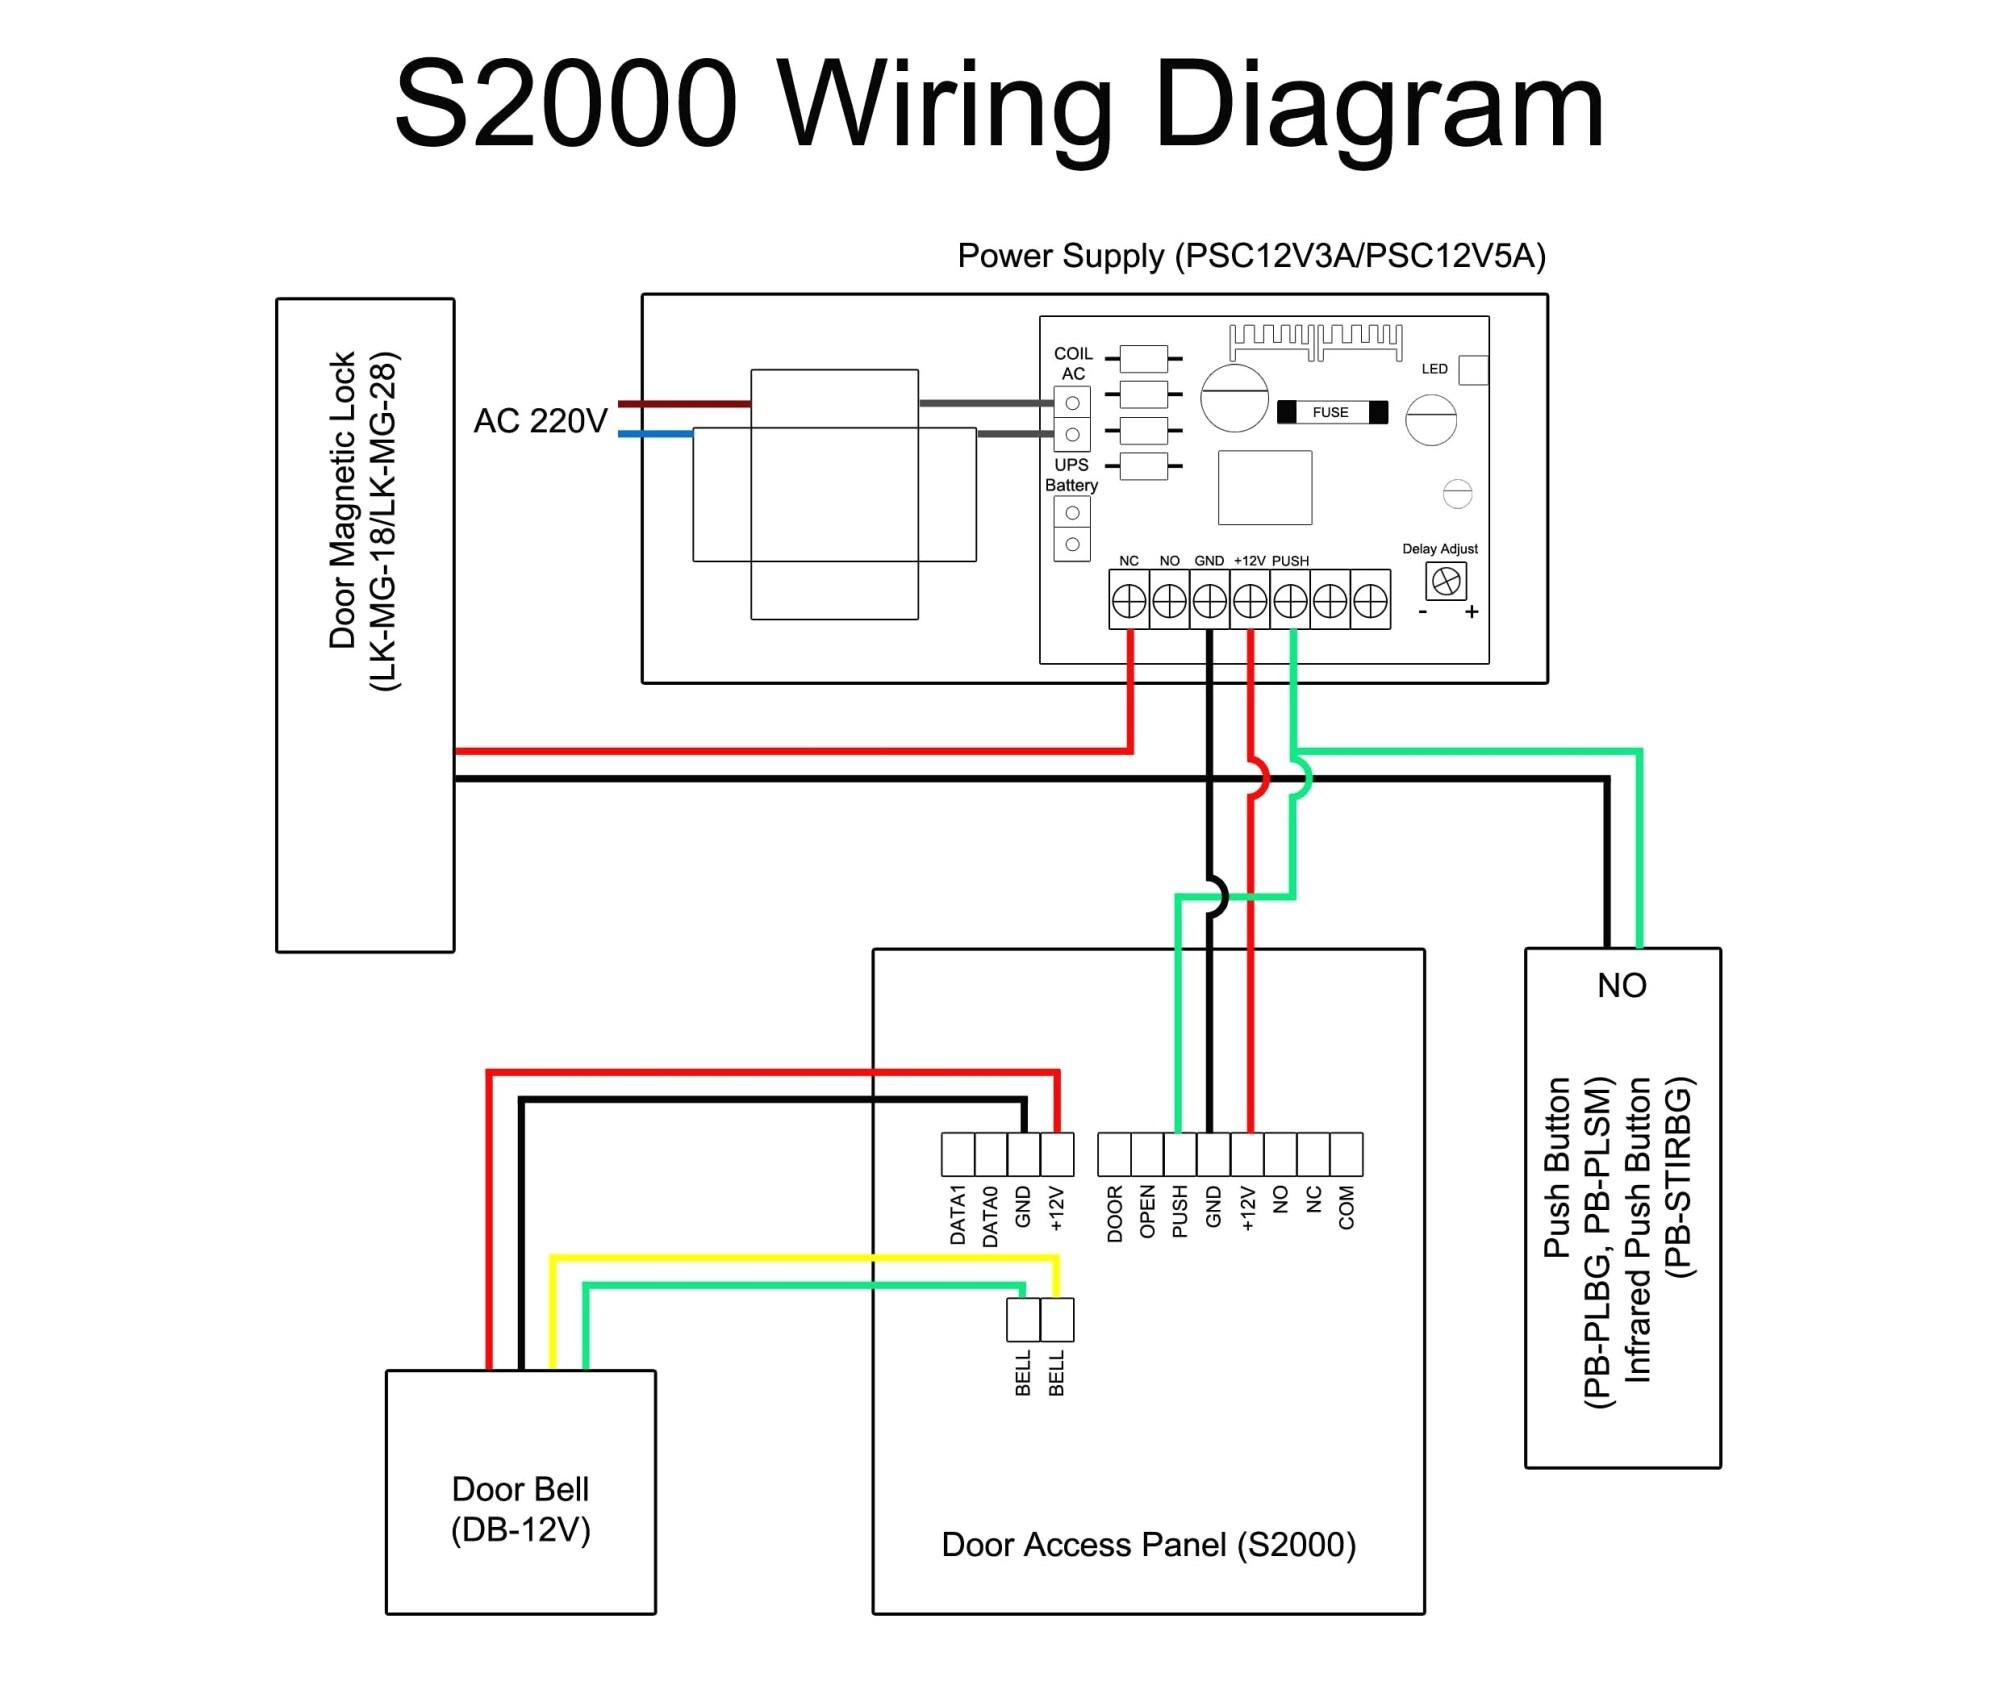 hight resolution of bose acoustimass wiring diagram wiring diagram ac samsung new cmos camera wiring diagram cinema paradiso